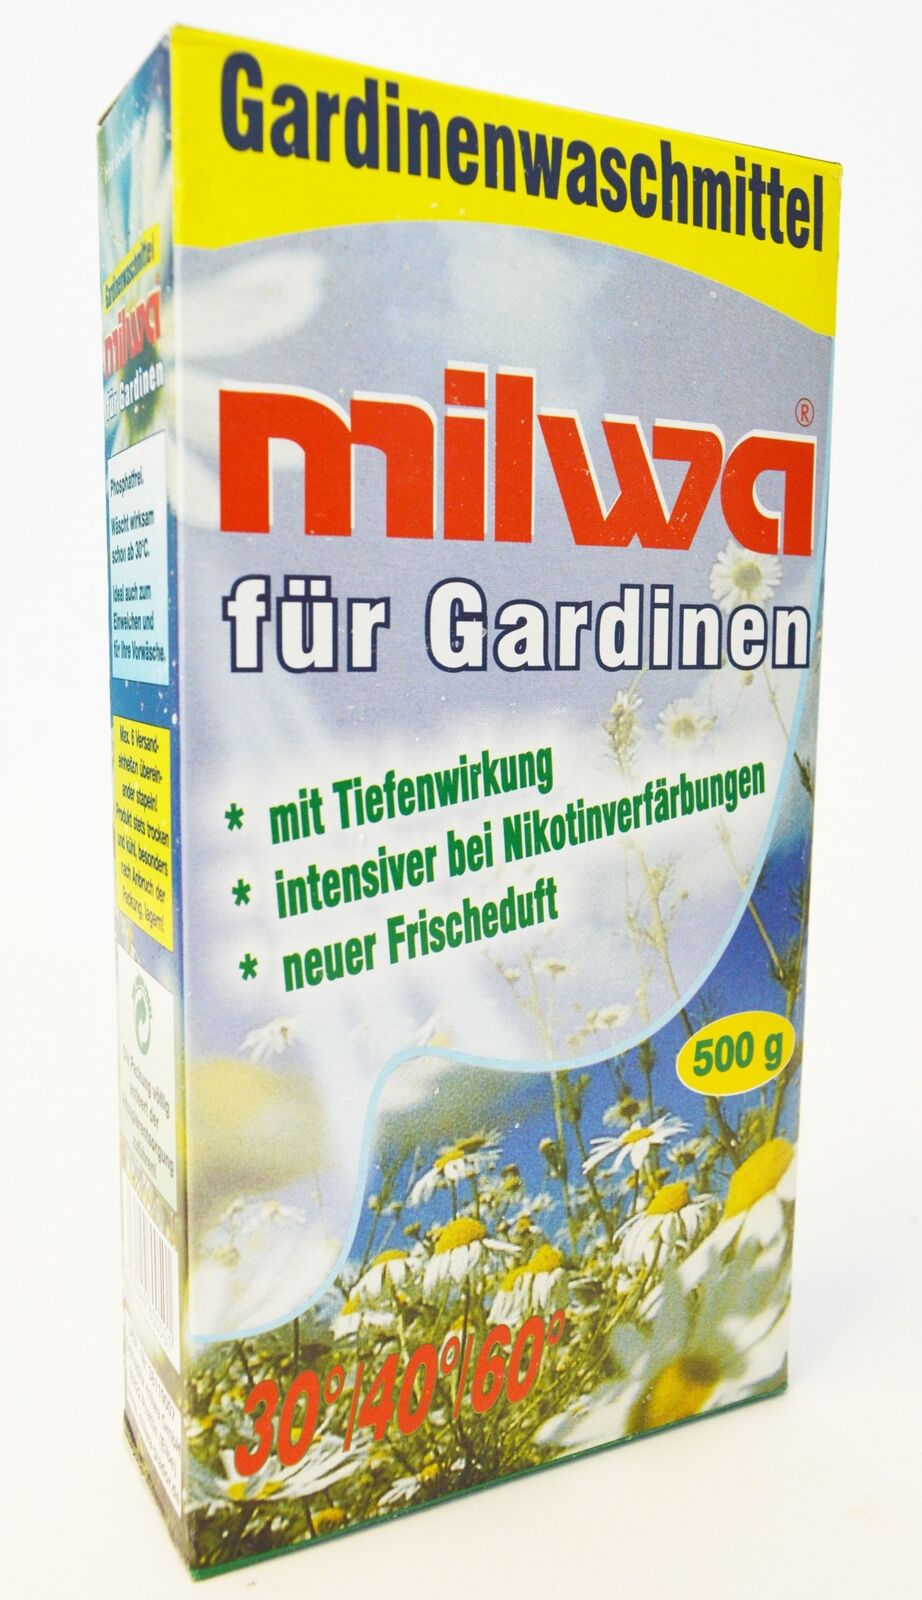 Milwa Gardinenwaschmittel